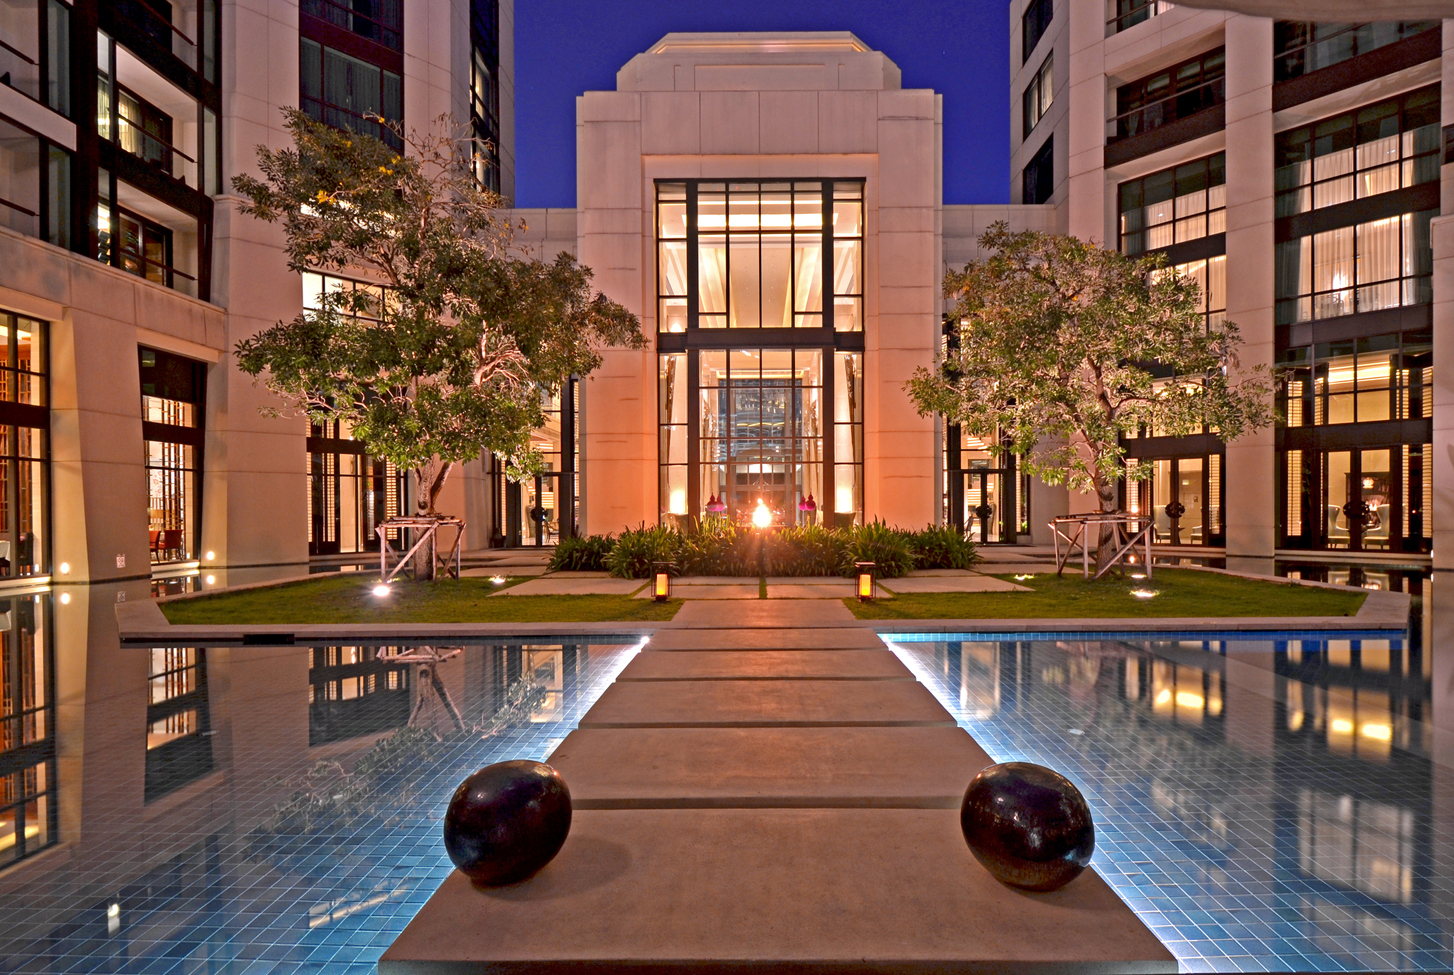 Siam Kempinski的設計氣派細膩,每一處都能望見以蓮花為概念打造的精緻裝潢,共提供303間房間讓旅客選擇。